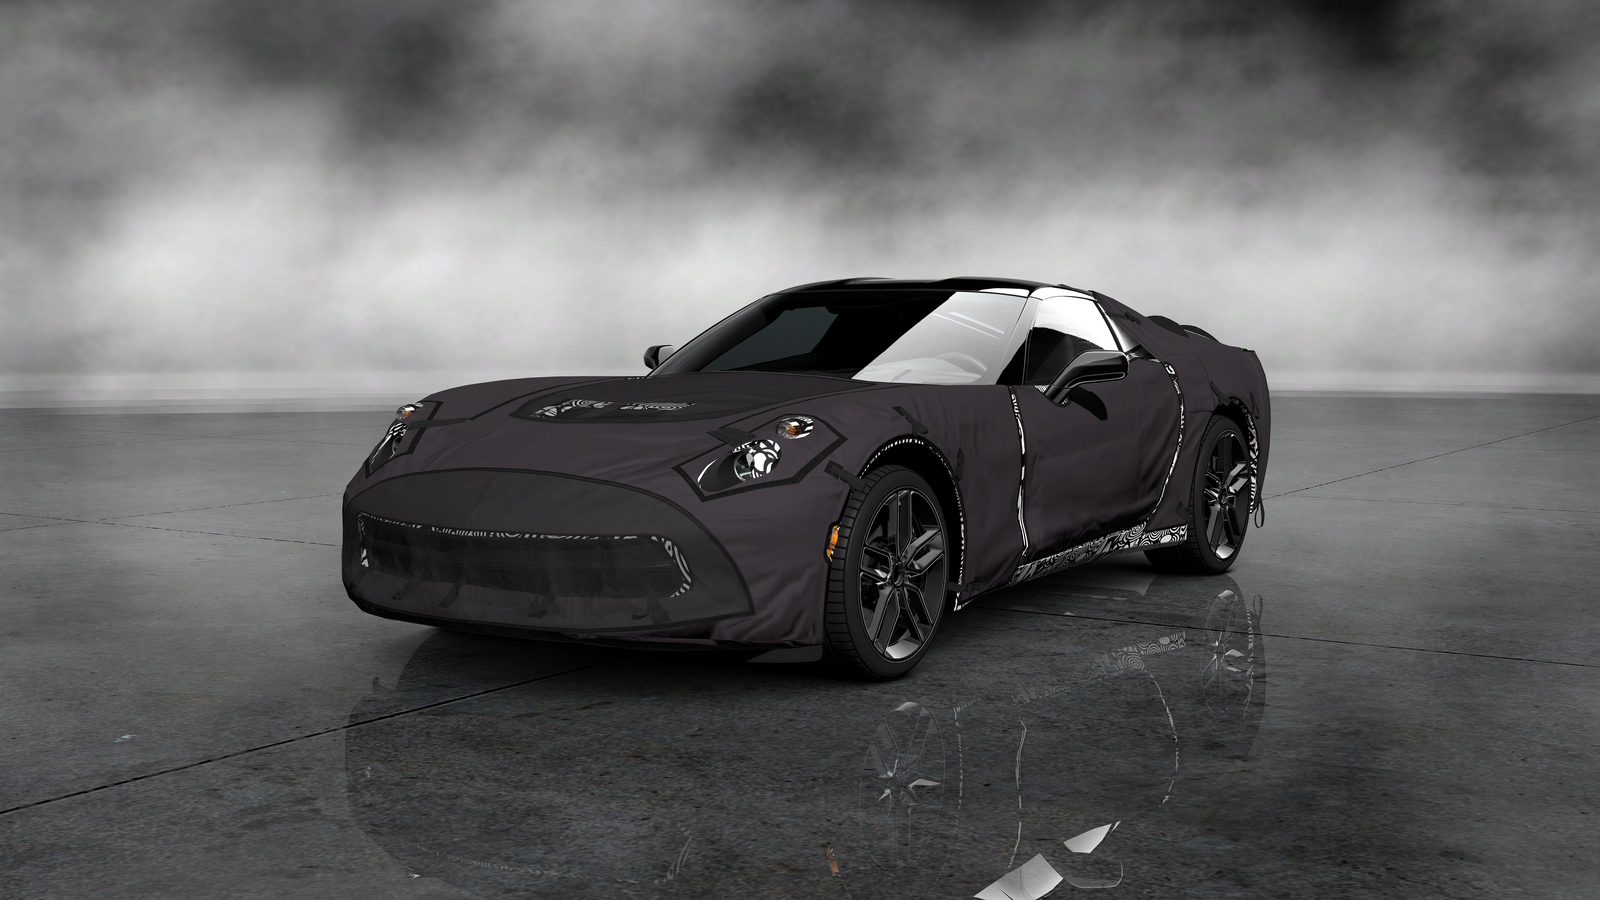 Gran Turismo 5 – Corvette C7 Test Prototype '13 ab heute verfügbar